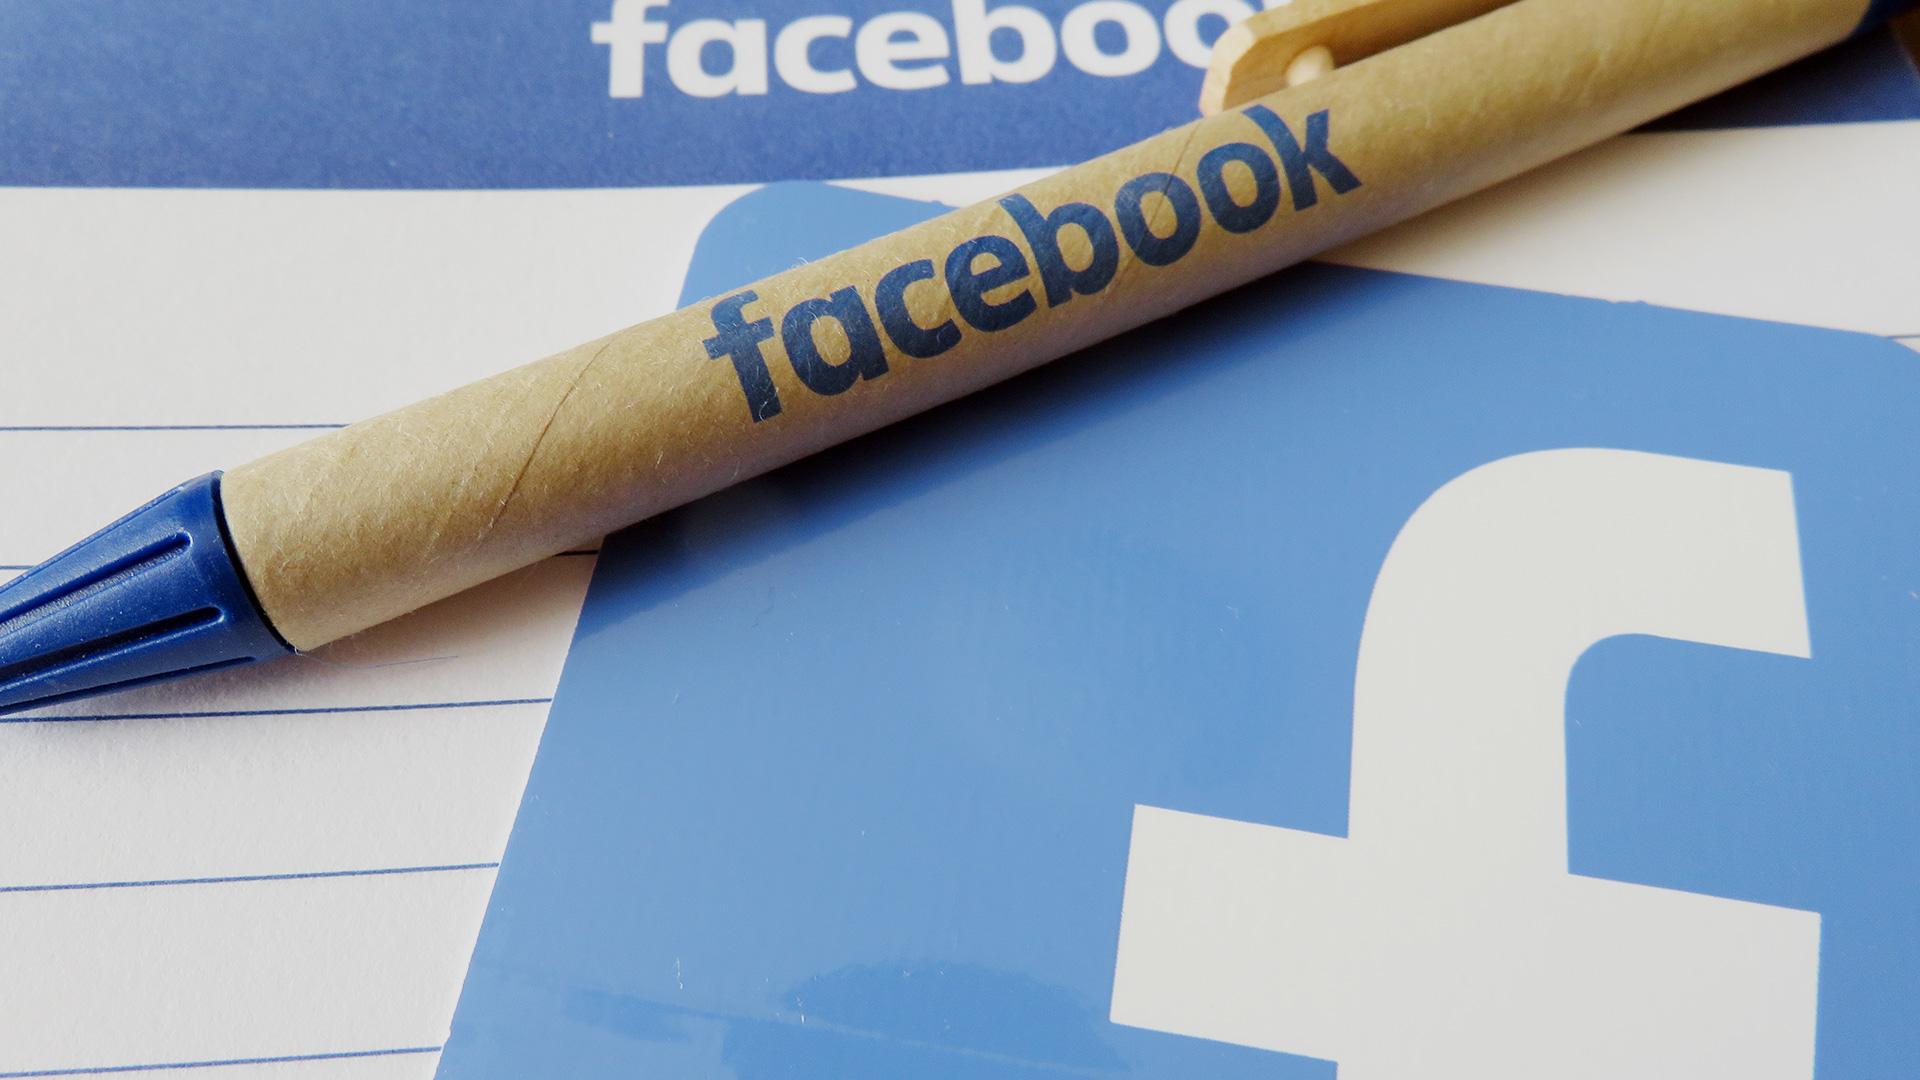 facebook-logo-notepad3-1920